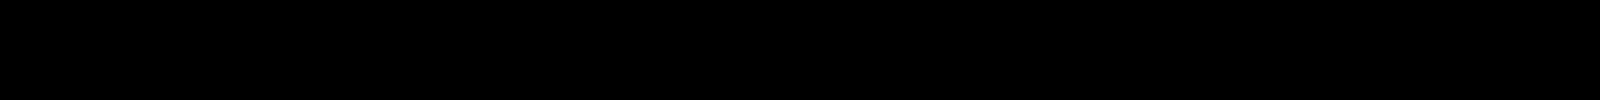 Minecraft z2font | FontStruct